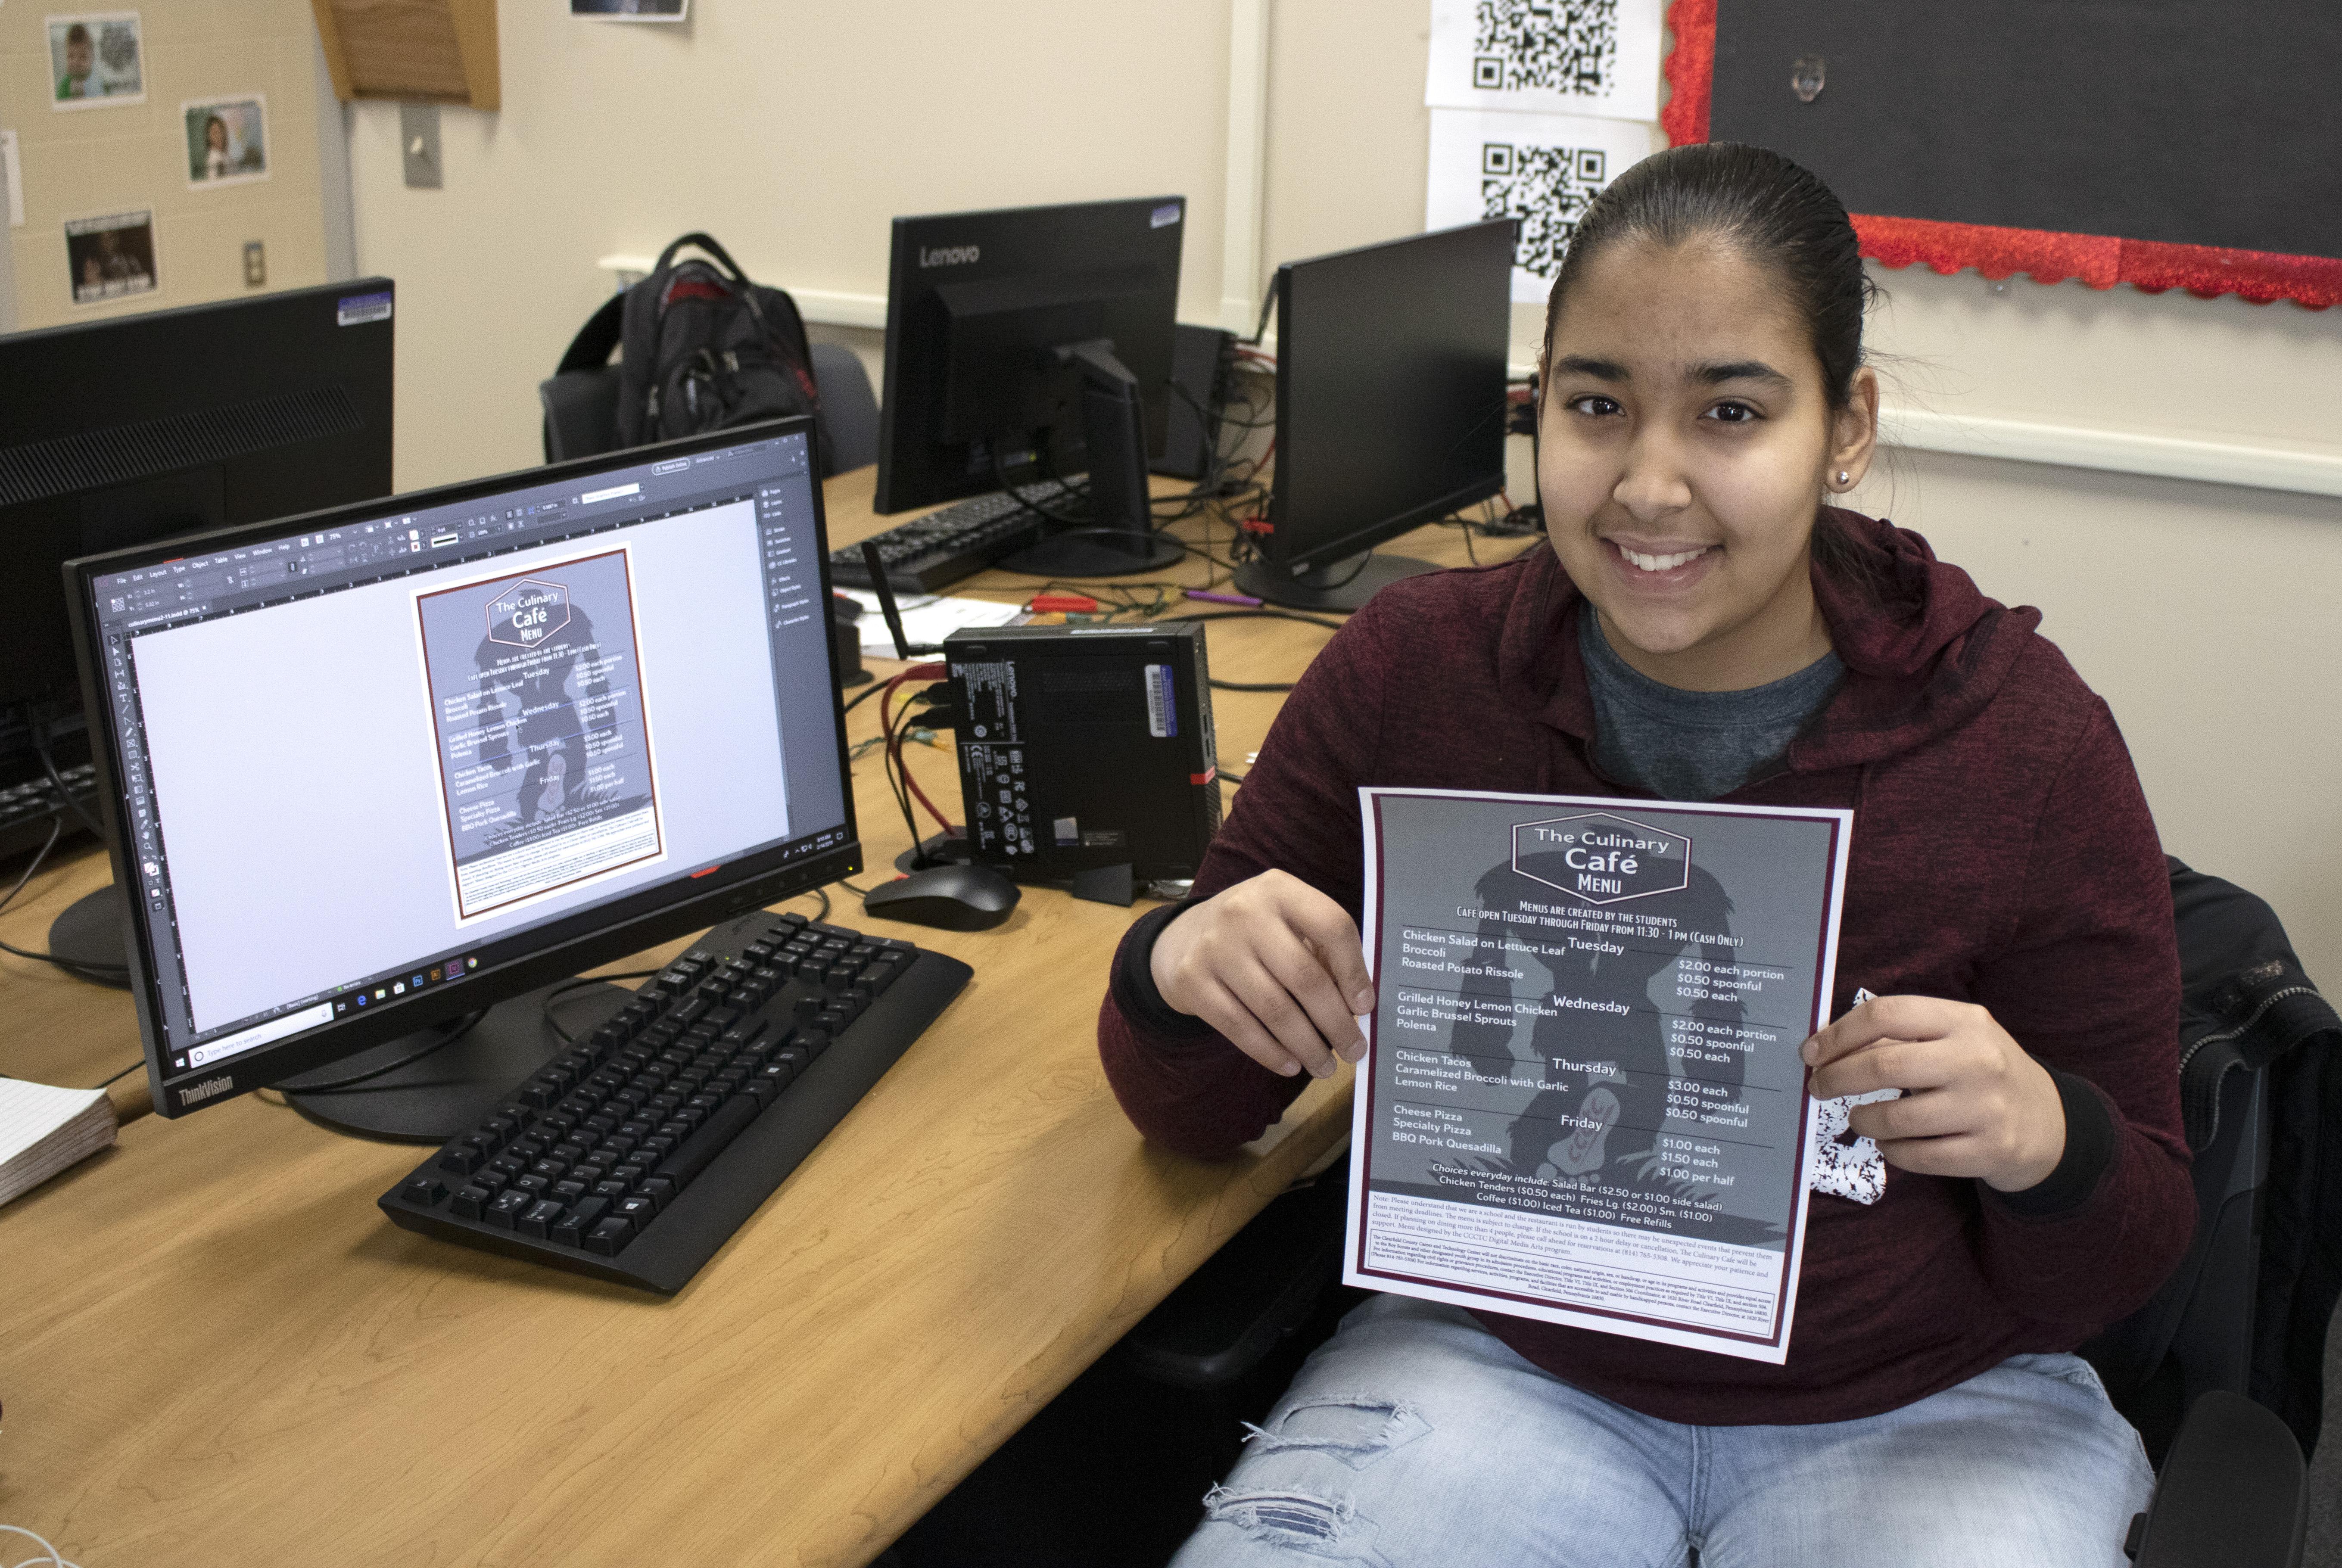 CCCTC Digital Media Arts Student Redesigned Cafe Menu